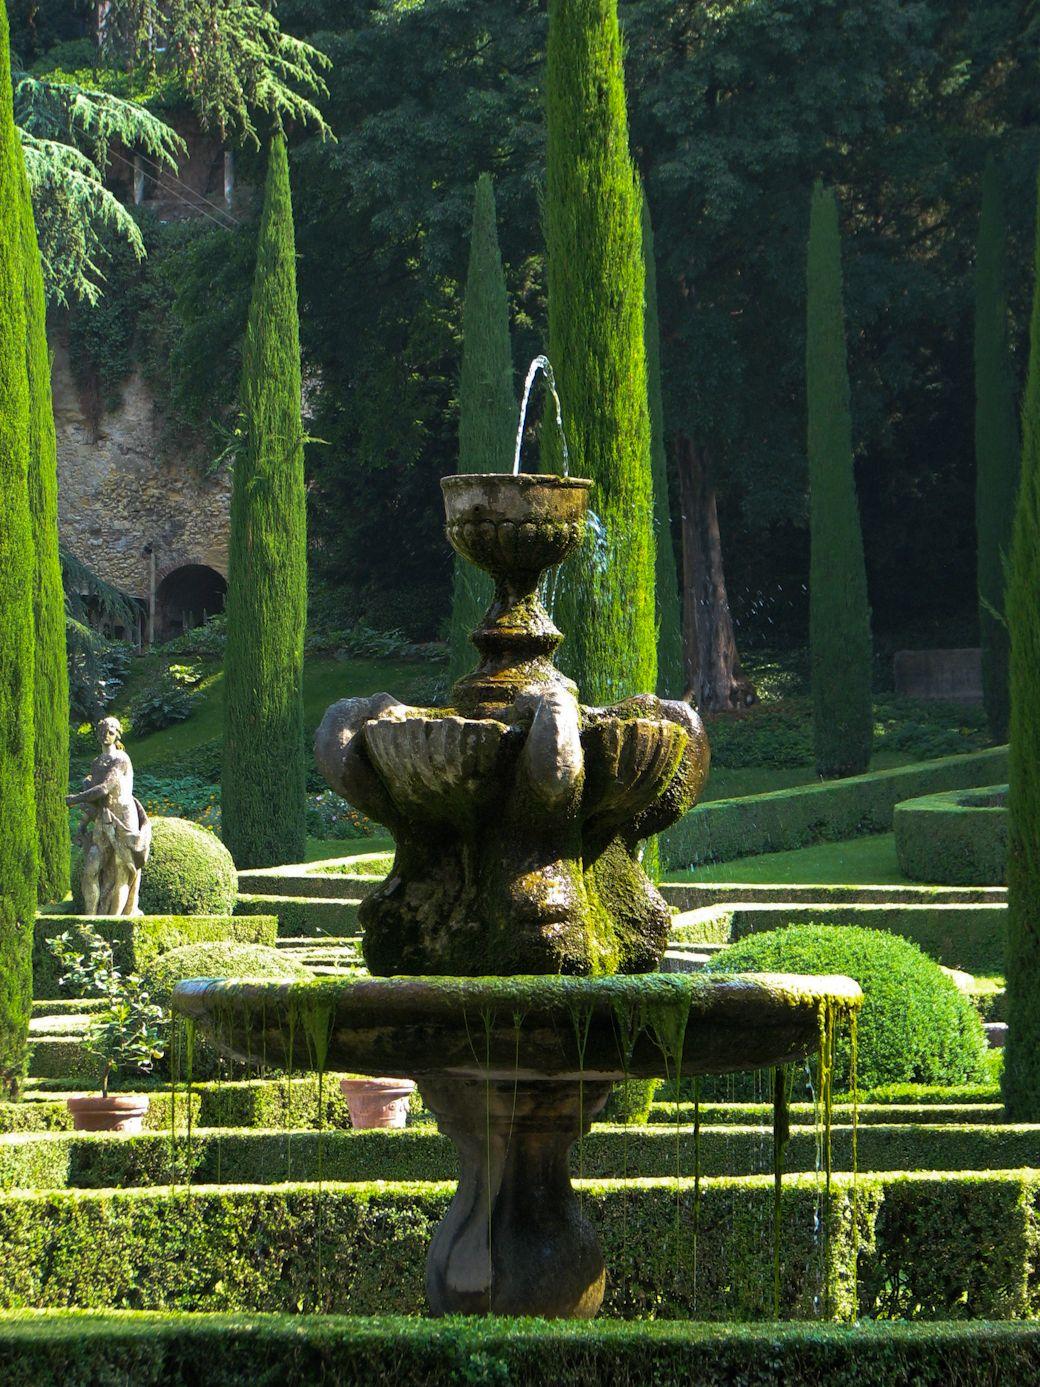 Giardini giusti verona italy by amycoady italy for Garden giardini